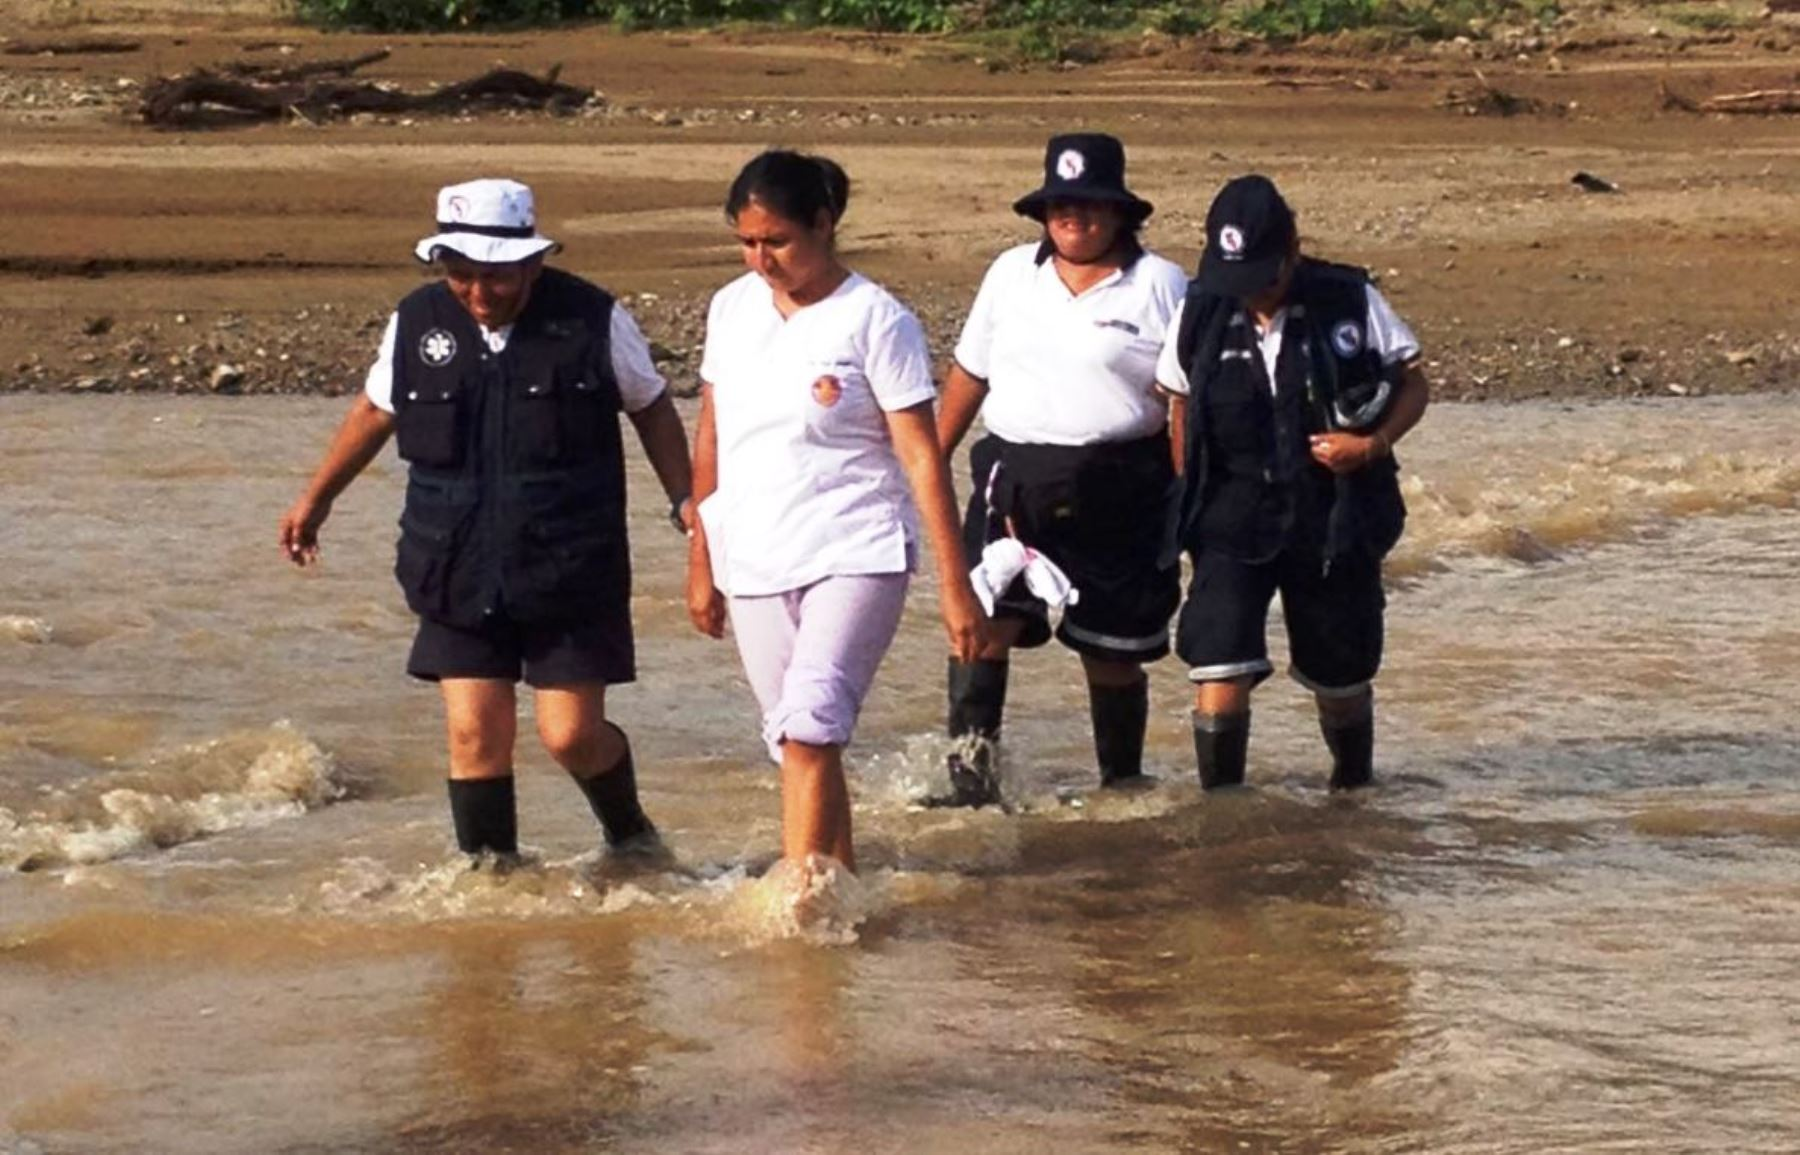 Minsa moviliza quinta brigada de atención médica en Picota, San Martín. ANDINA/Difusión